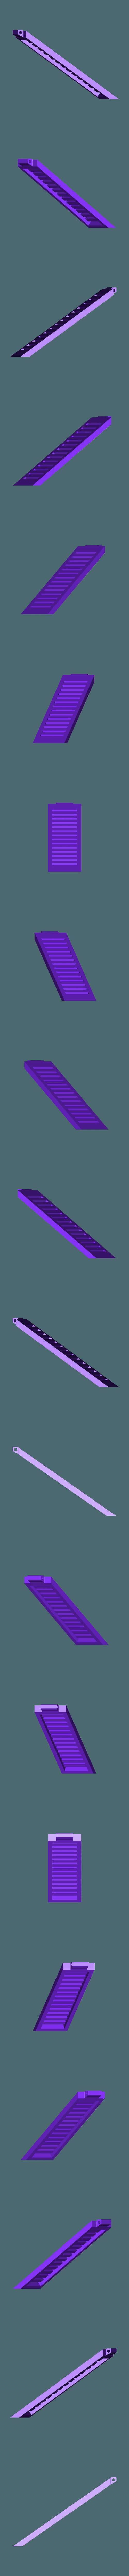 rampes scx24 rampe h50 35 deg.STL Download STL file AXIAL SCX24 mini or micro crawler Bridge 50 mm  • 3D printing design, lulu3Dbuilder